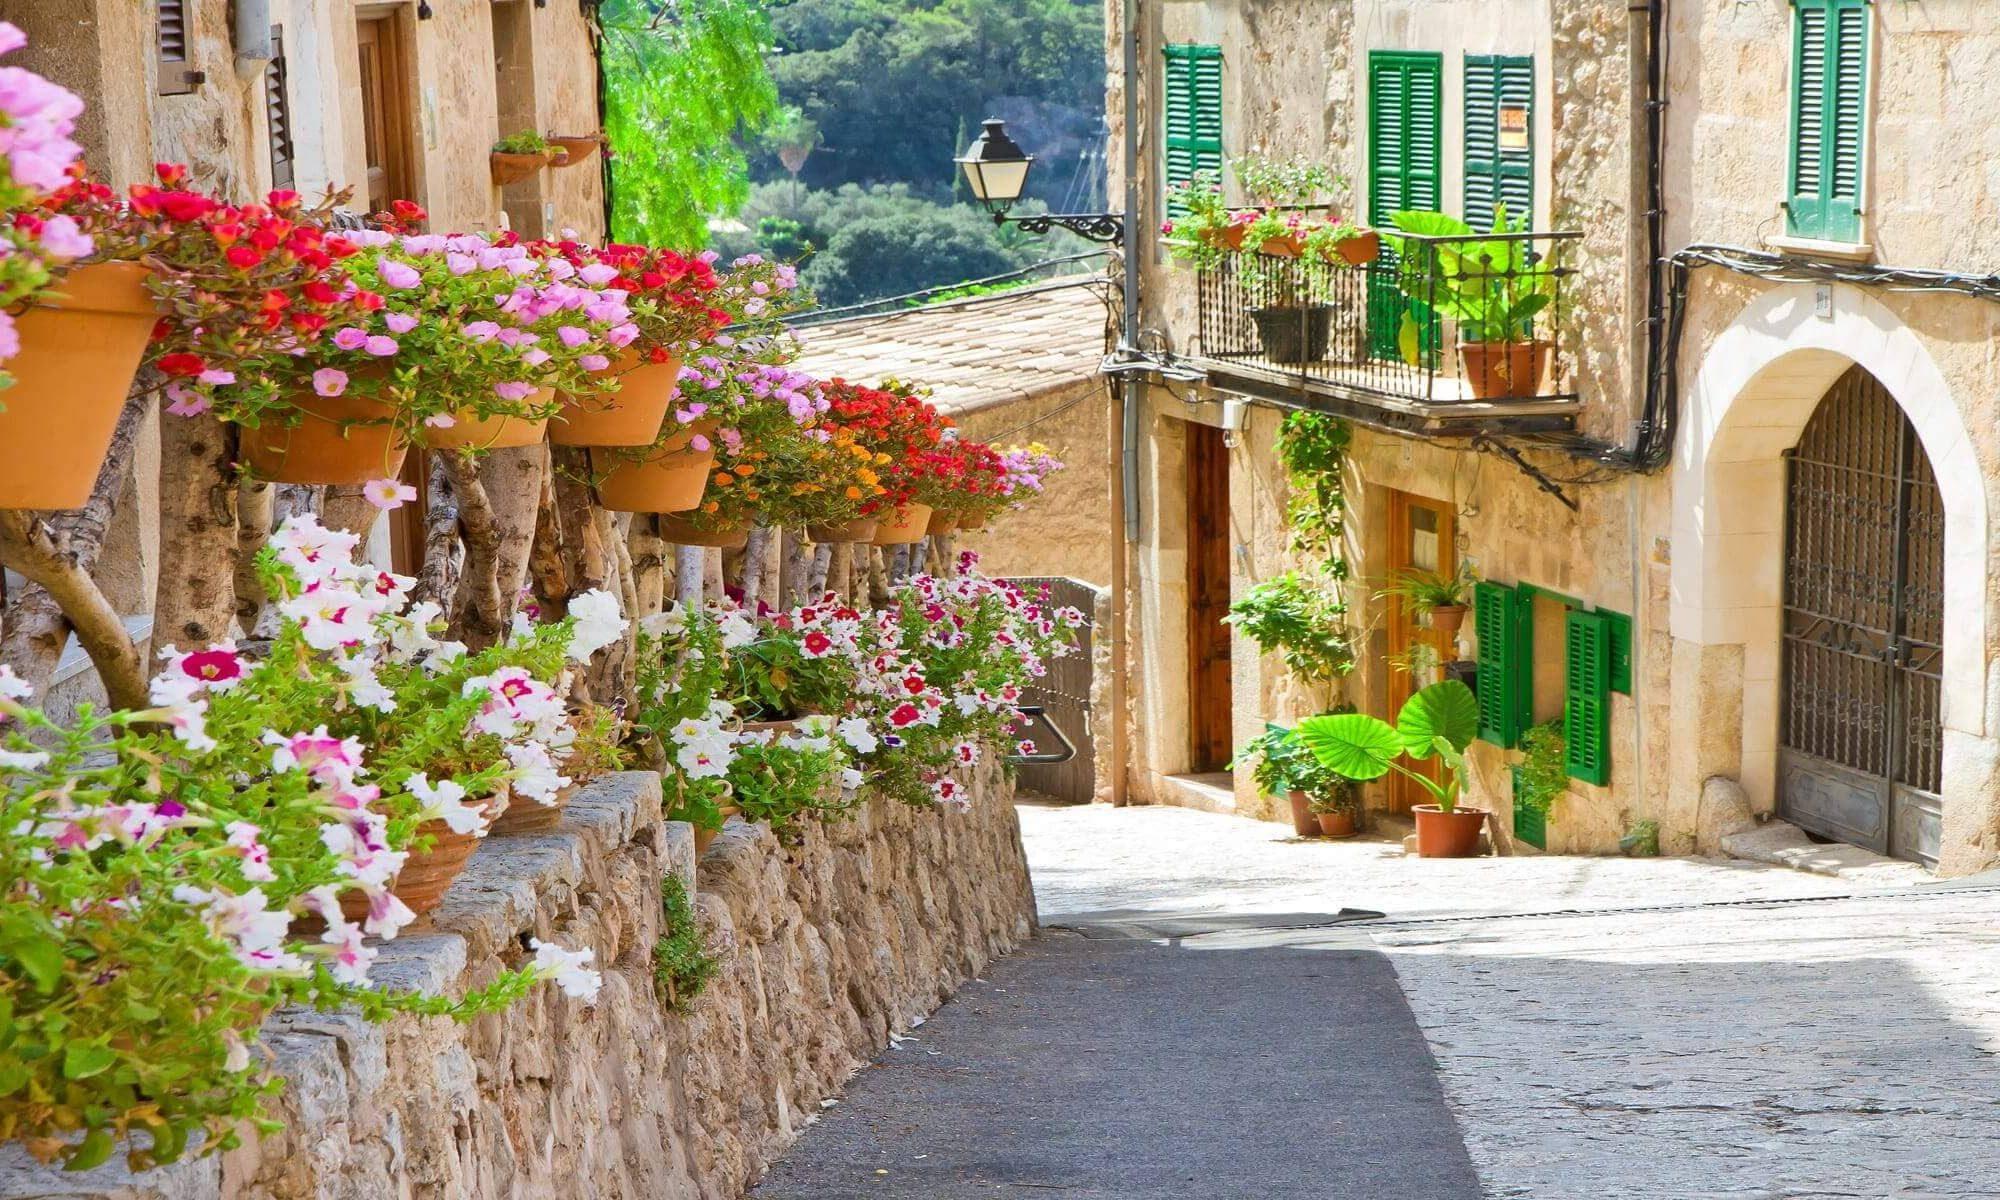 Singlereise nach Mallorca - Malerisches Bergdorf